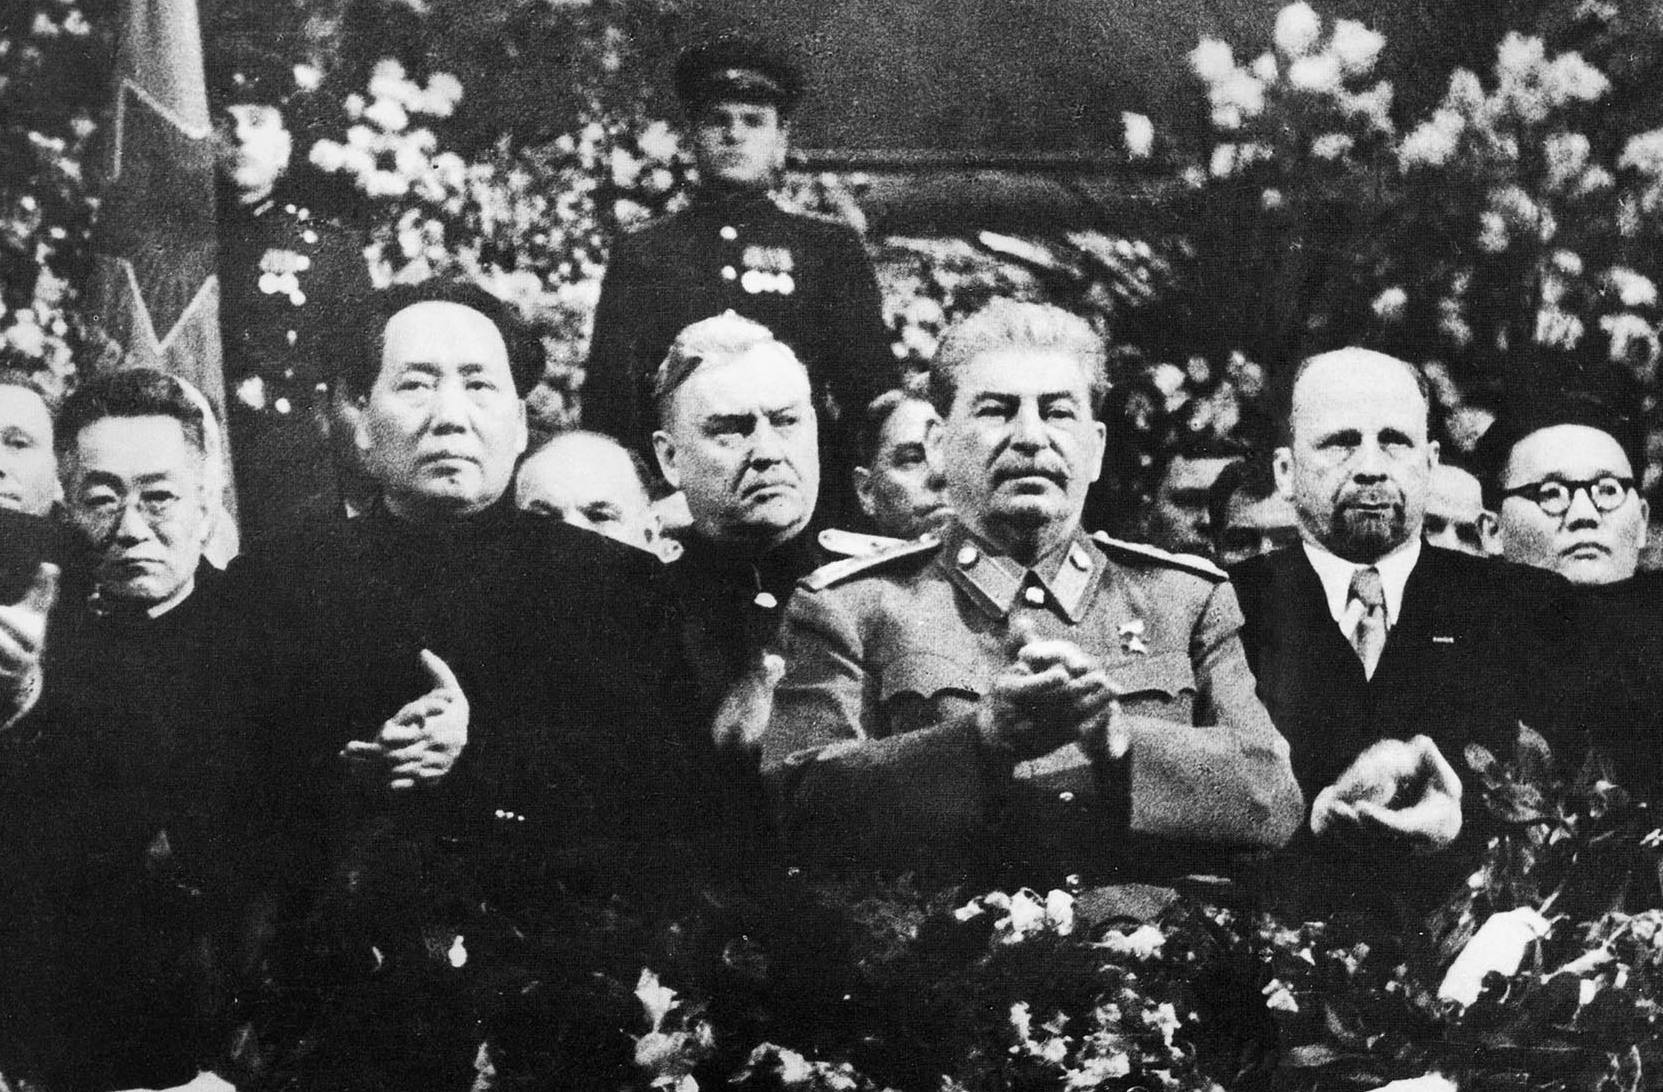 Mao%2C_Bulganin%2C_Stalin%2C_Ulbricht_Ts